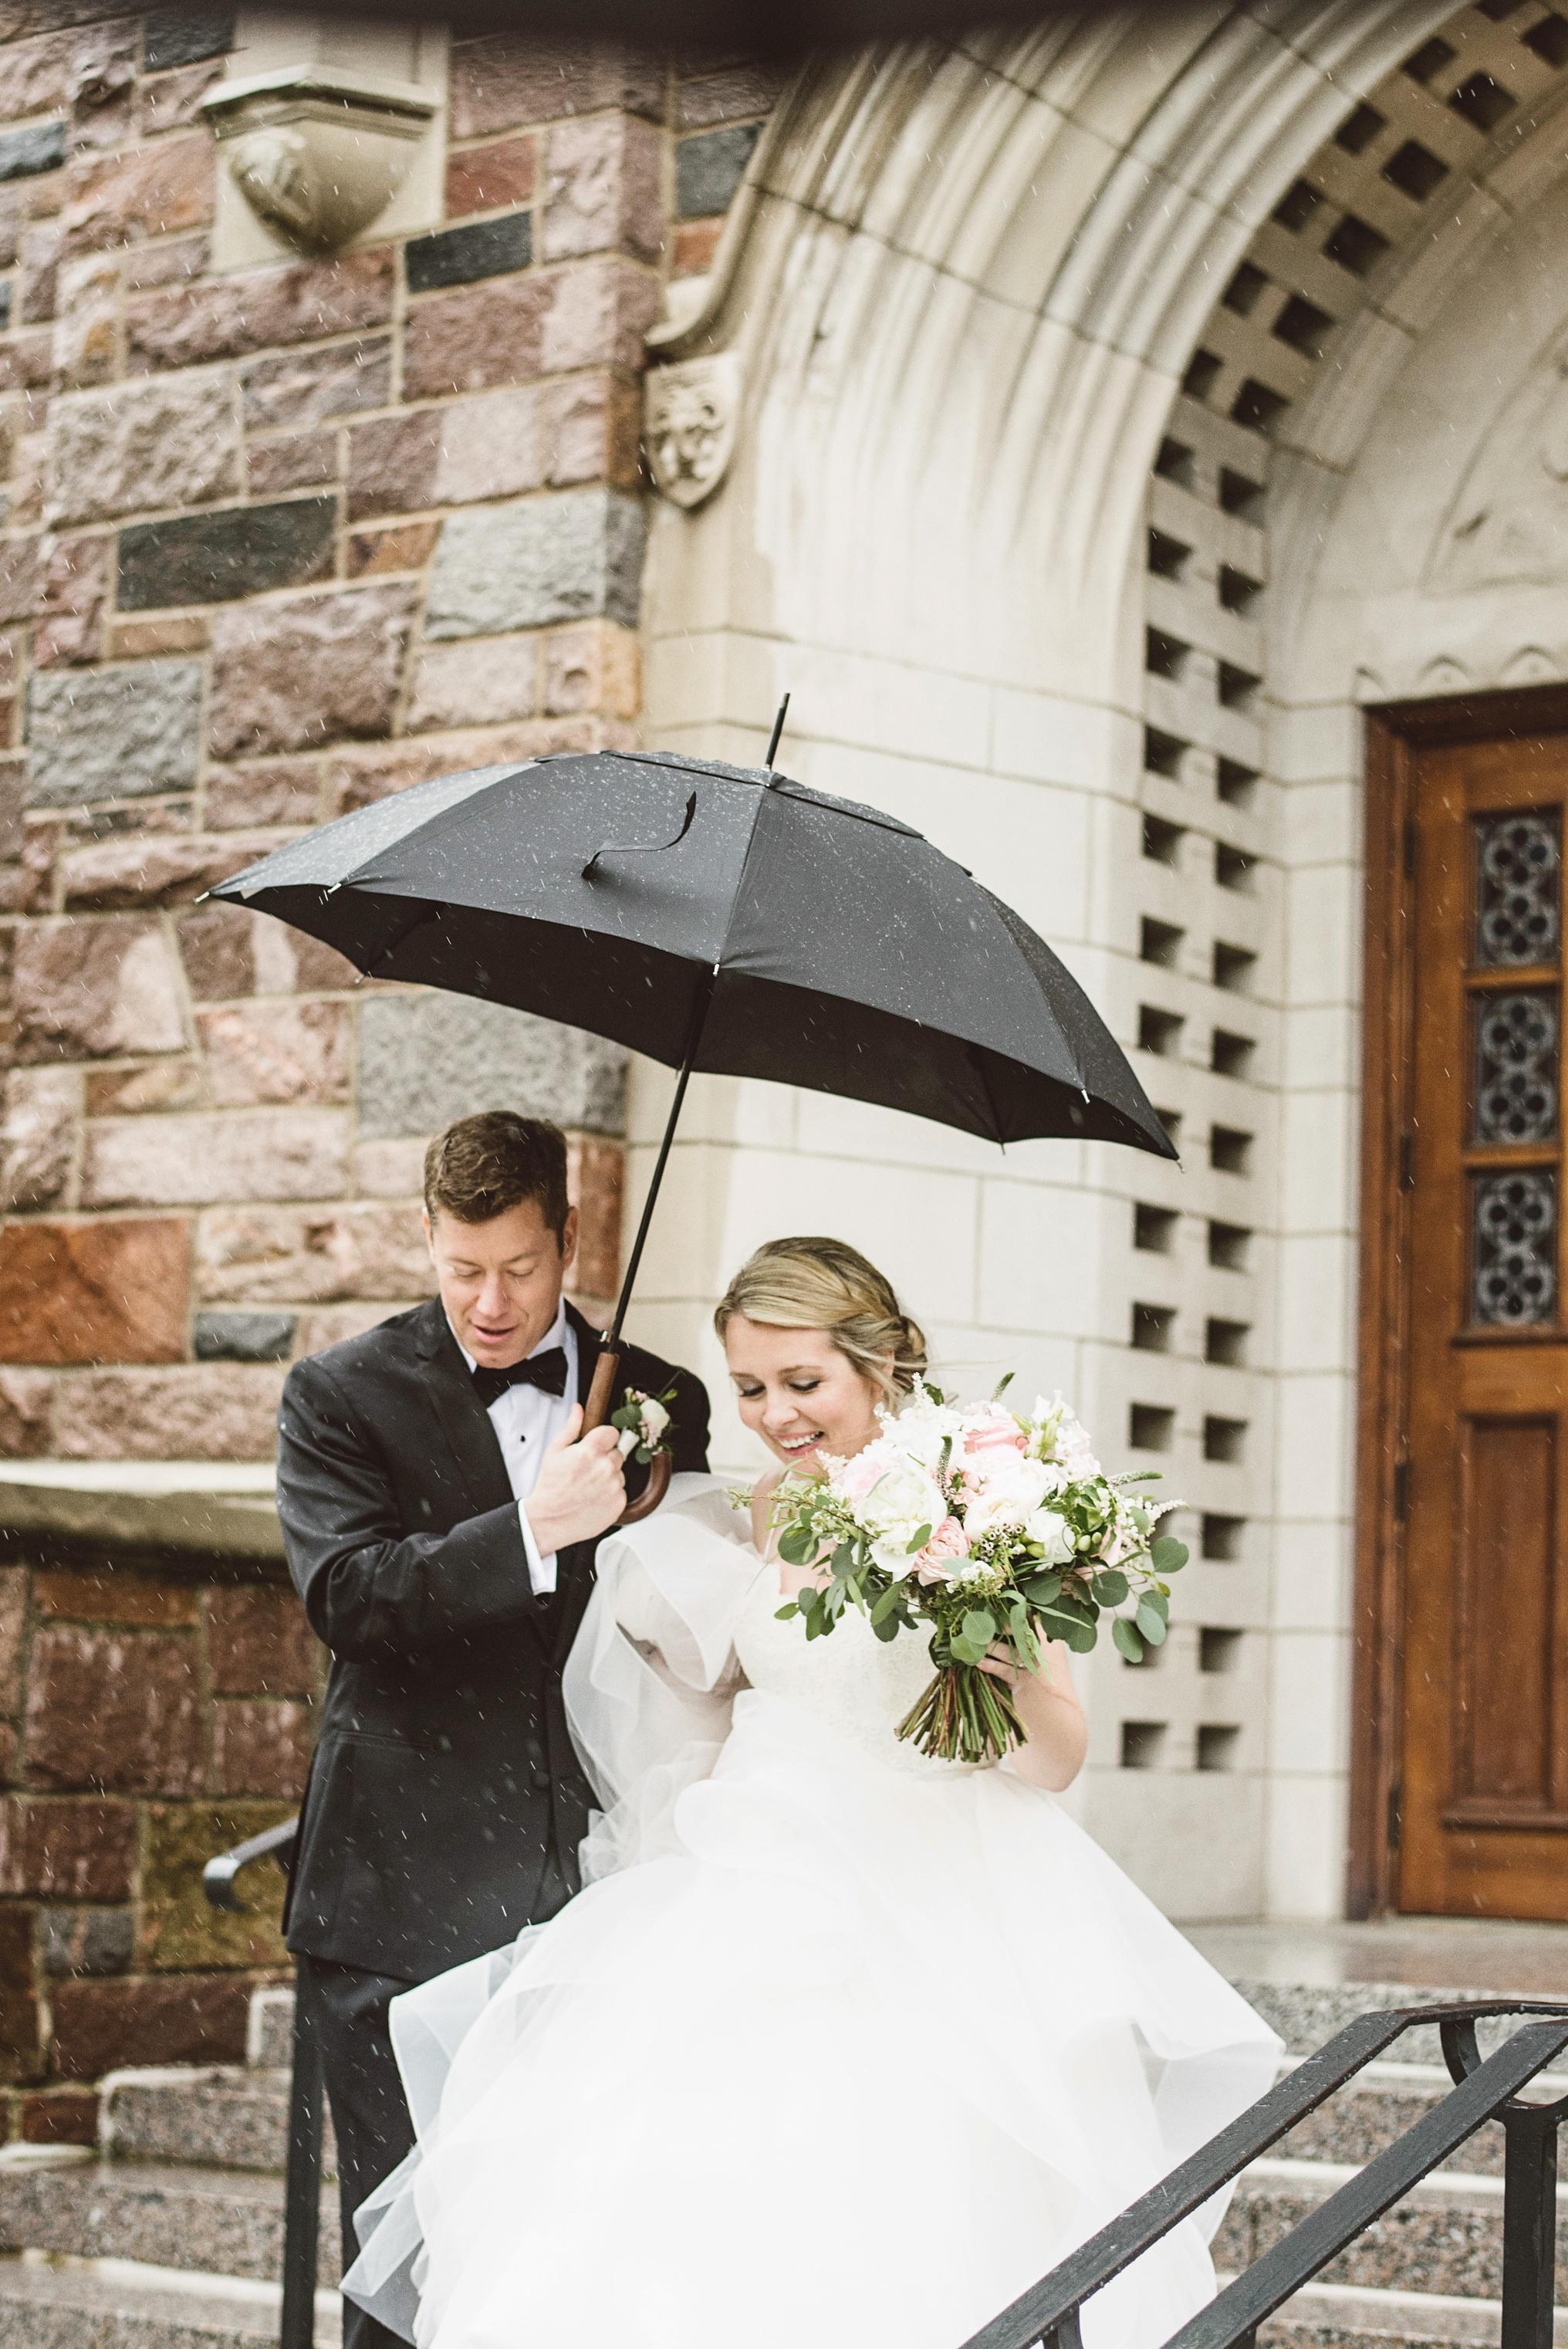 best_wedding_photography_2017_by_lucas_botz_photography_063.jpg